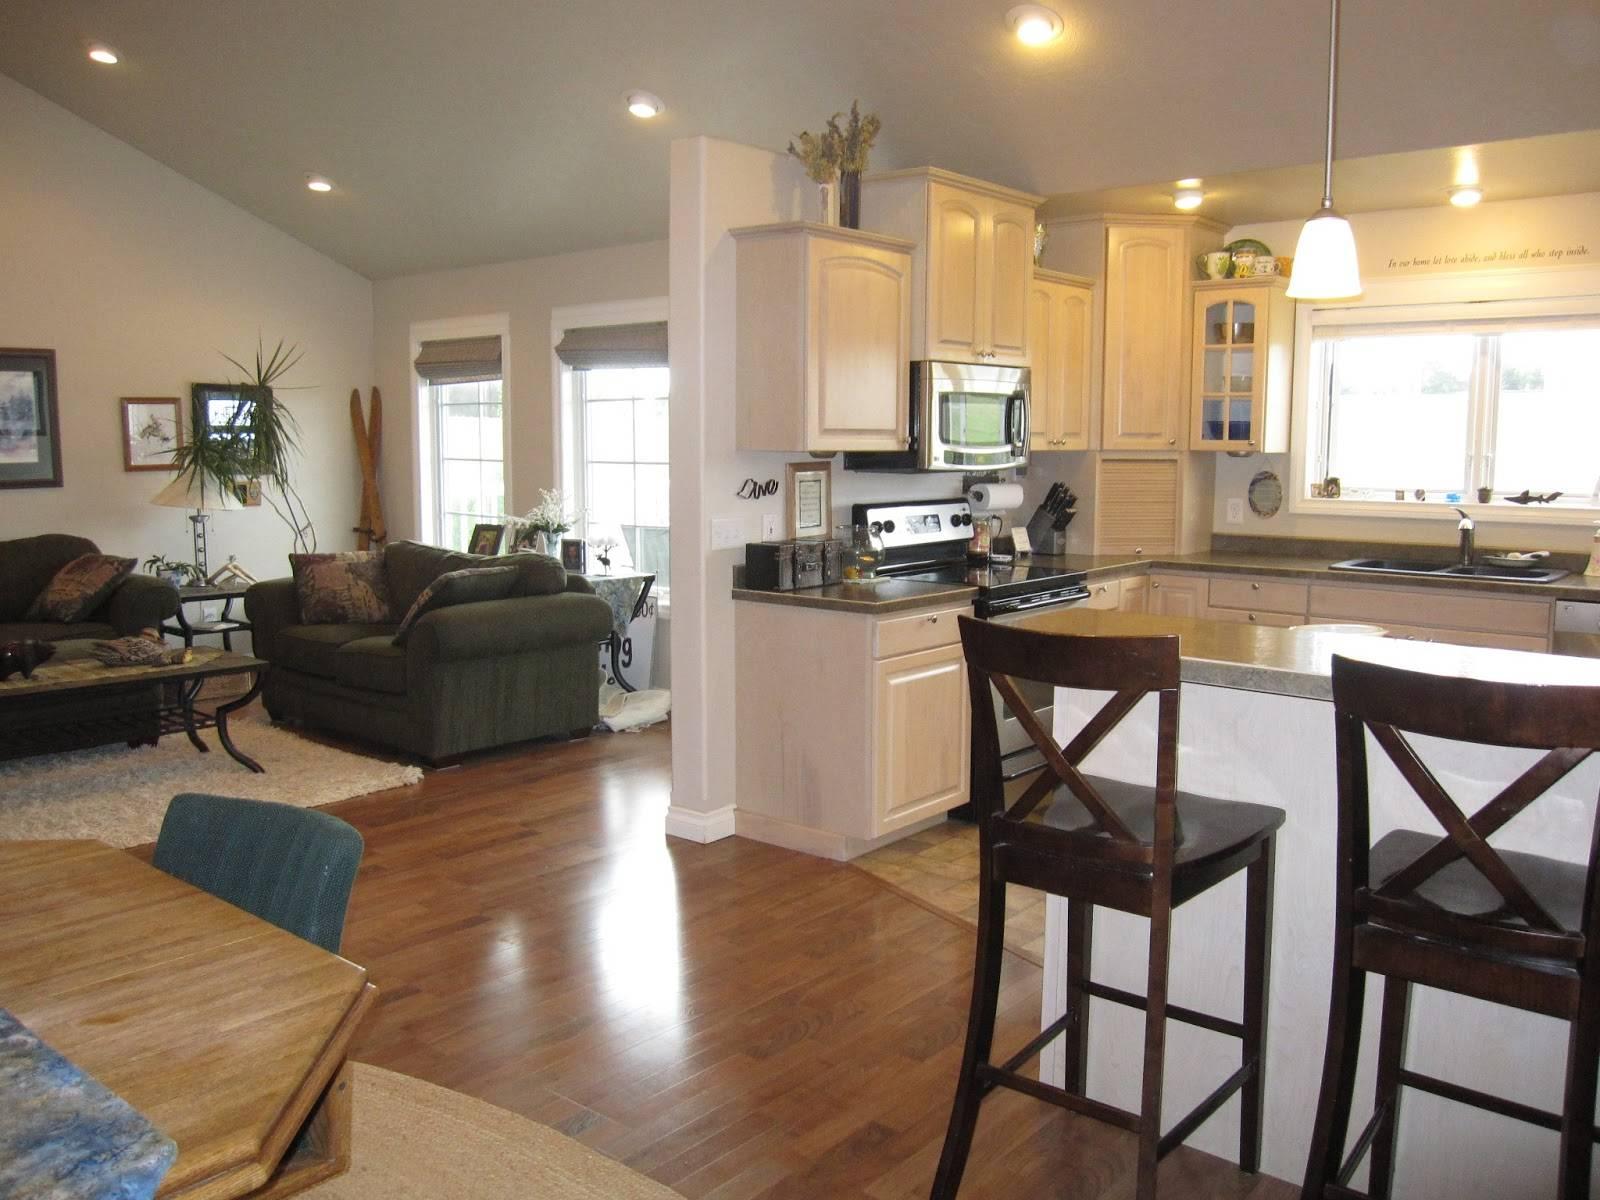 Open Concept Kitchen Living Room Floor Plans Design House Plans 30089